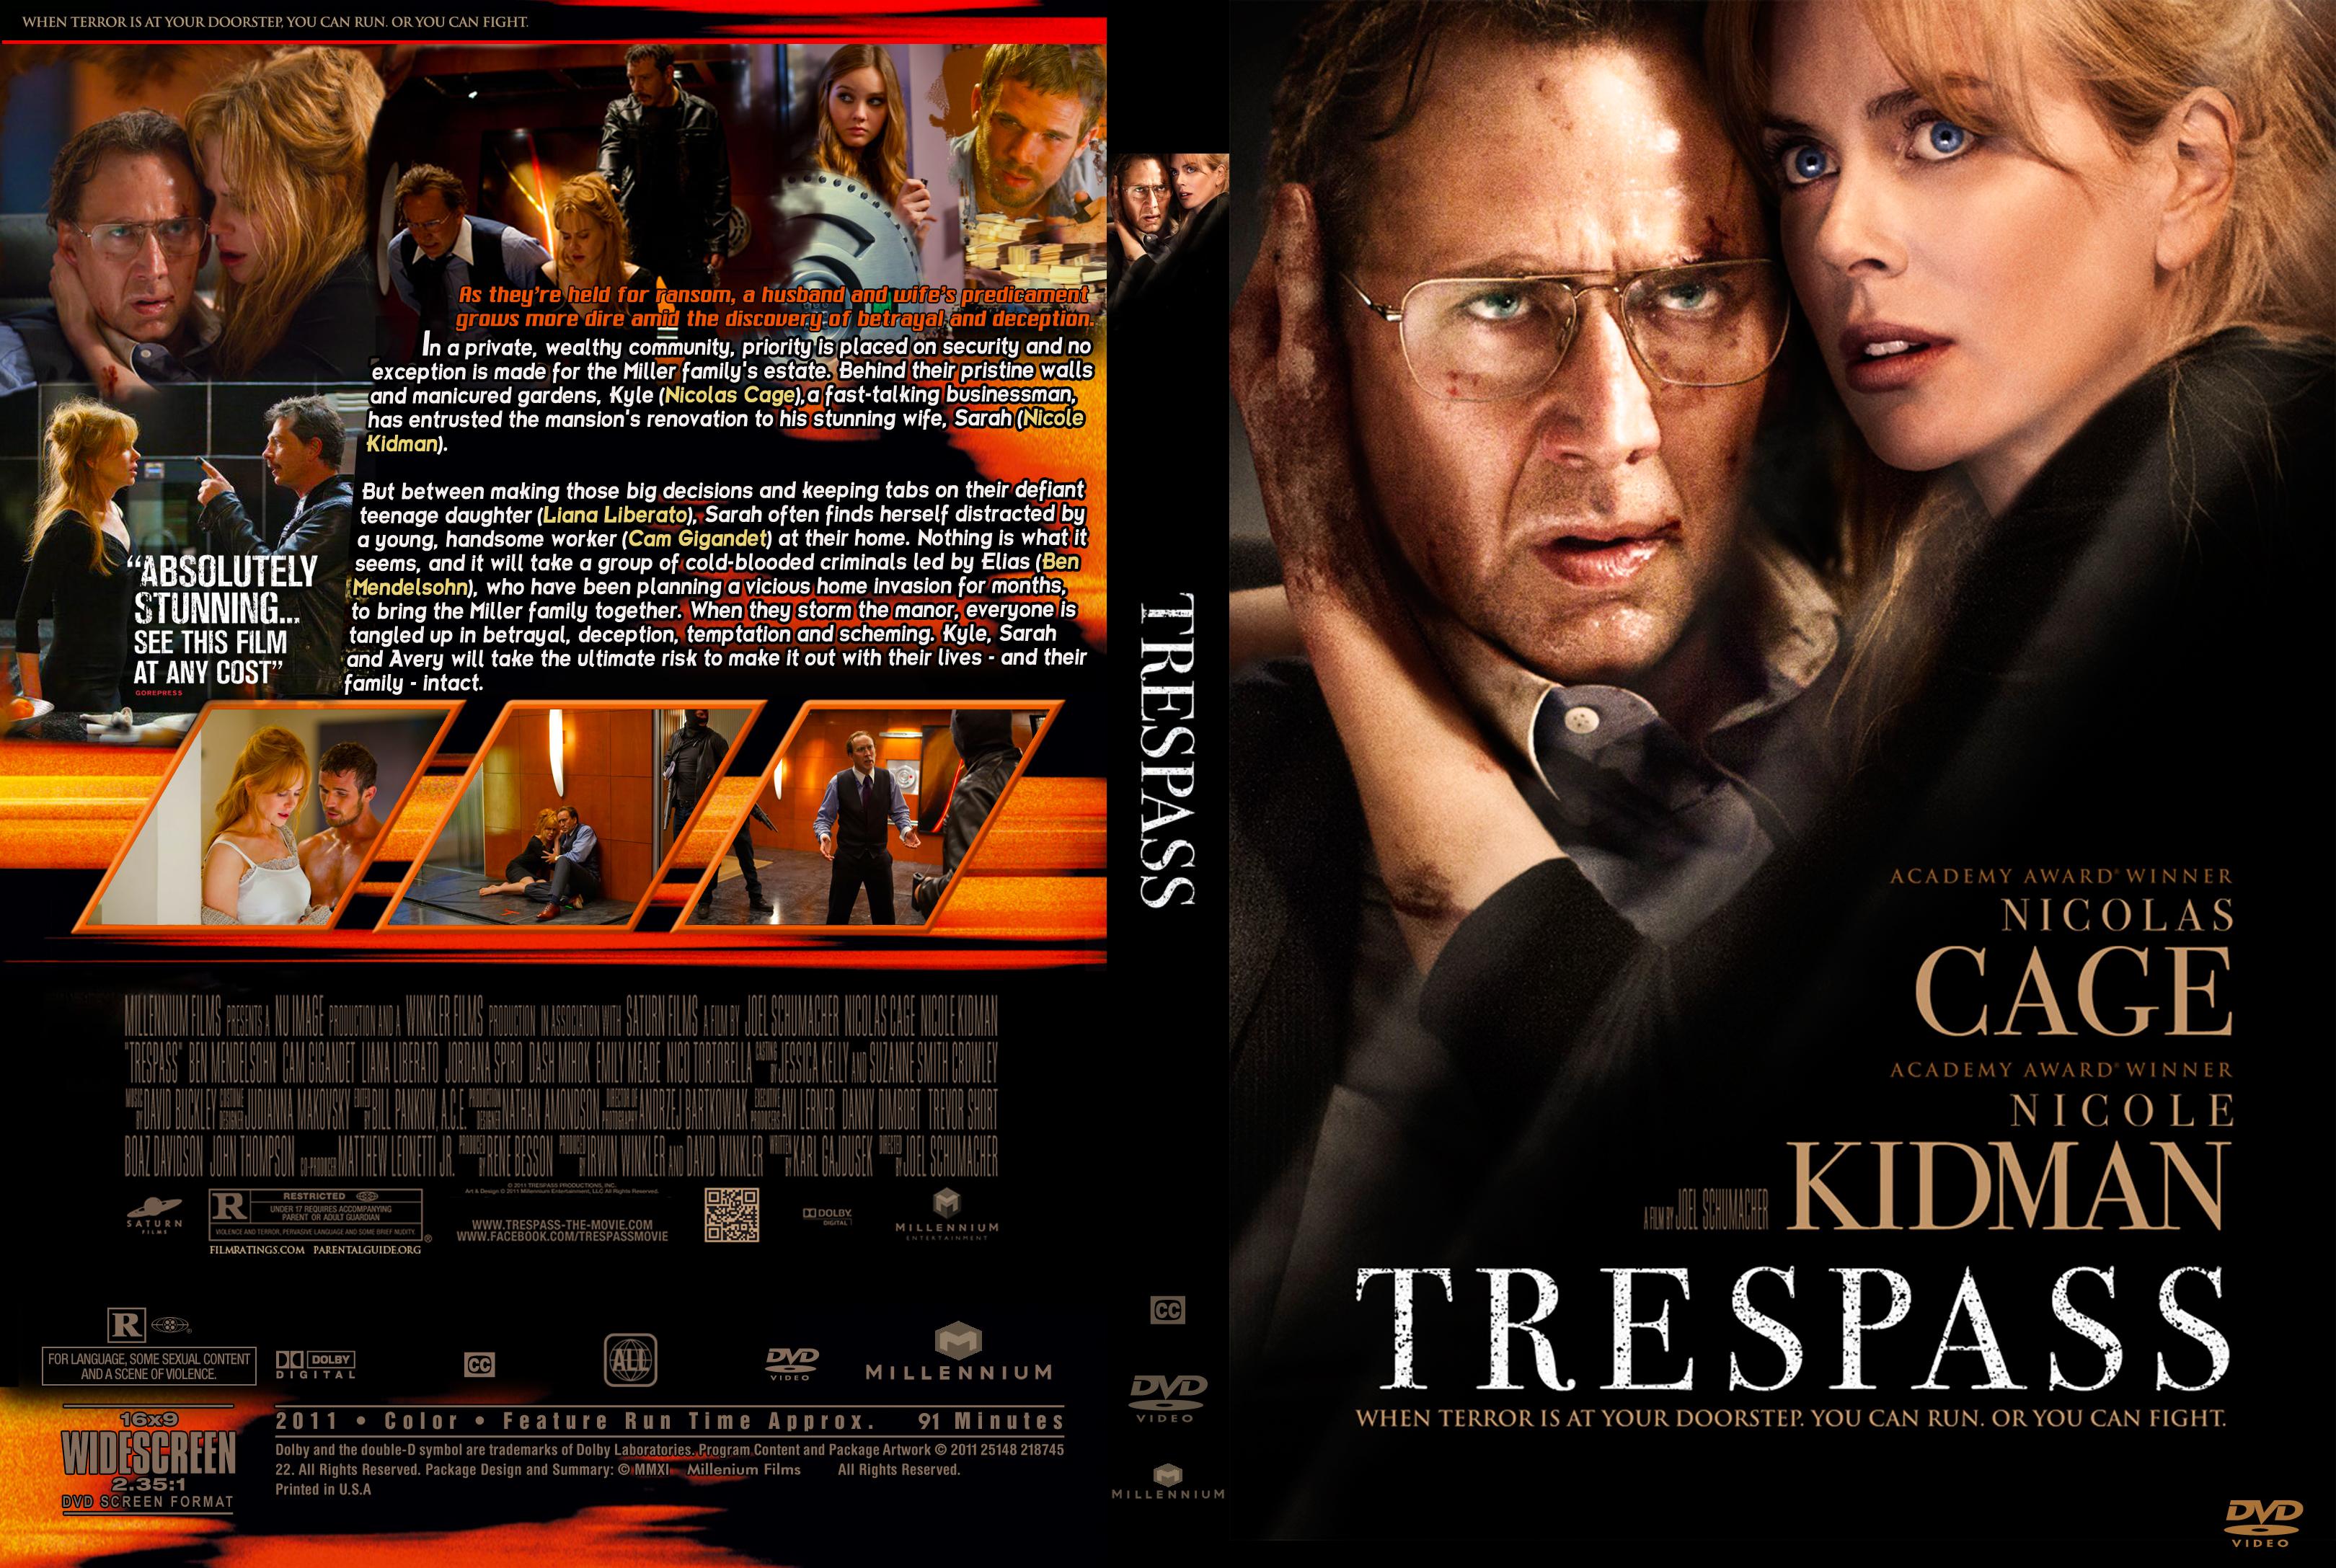 trespass 2011 full movie